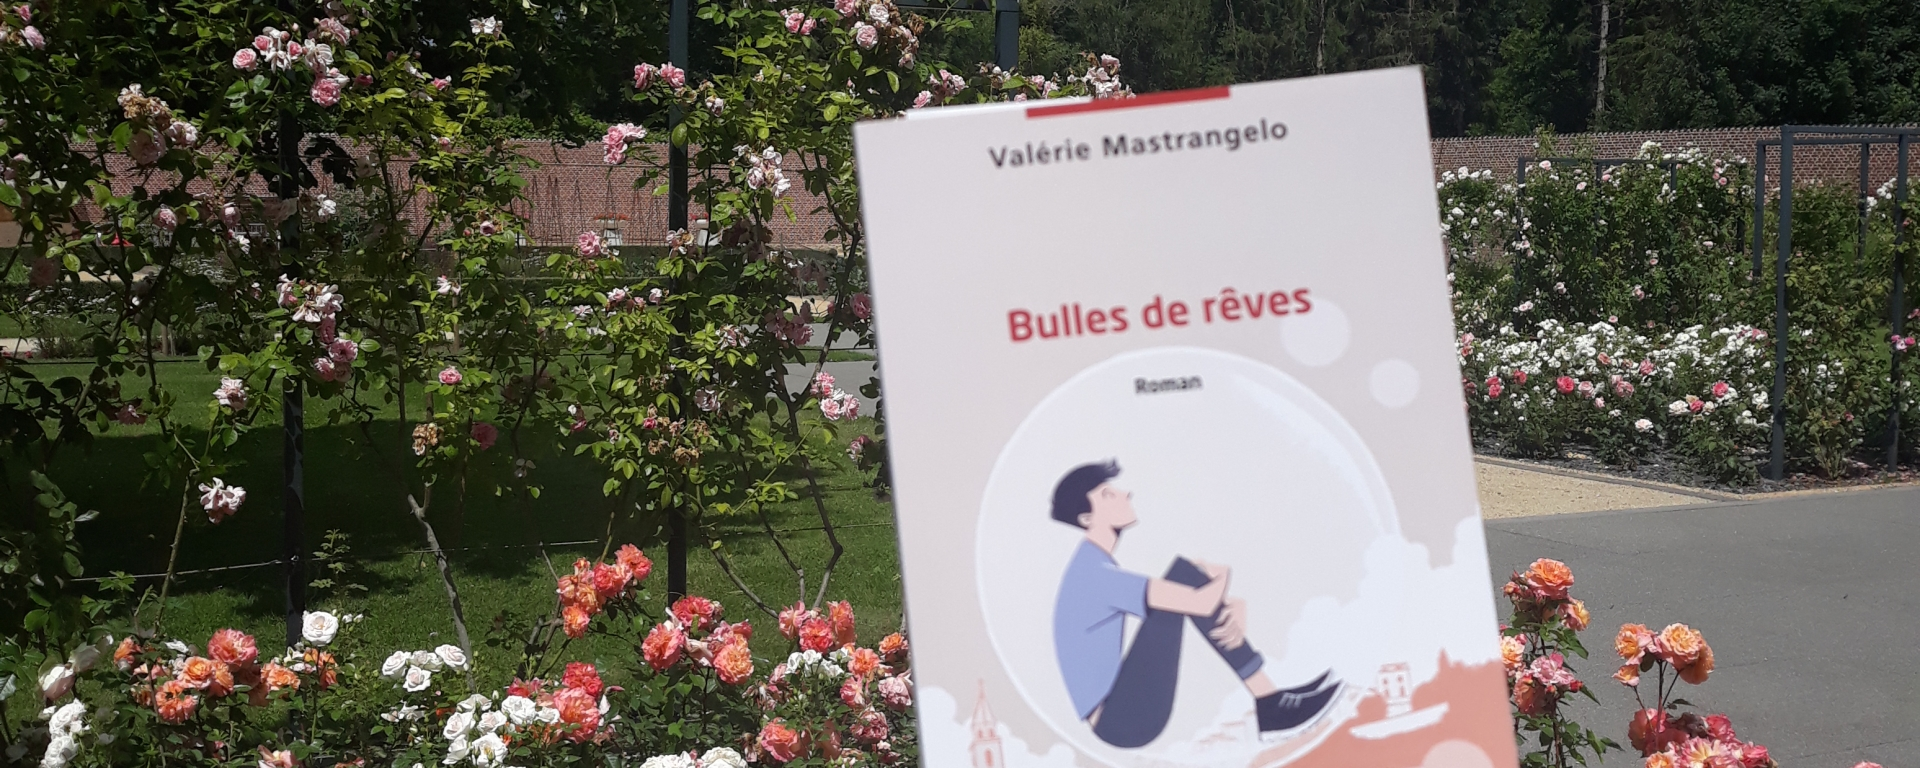 Bulles de rêves de Valérie Mastrangelo